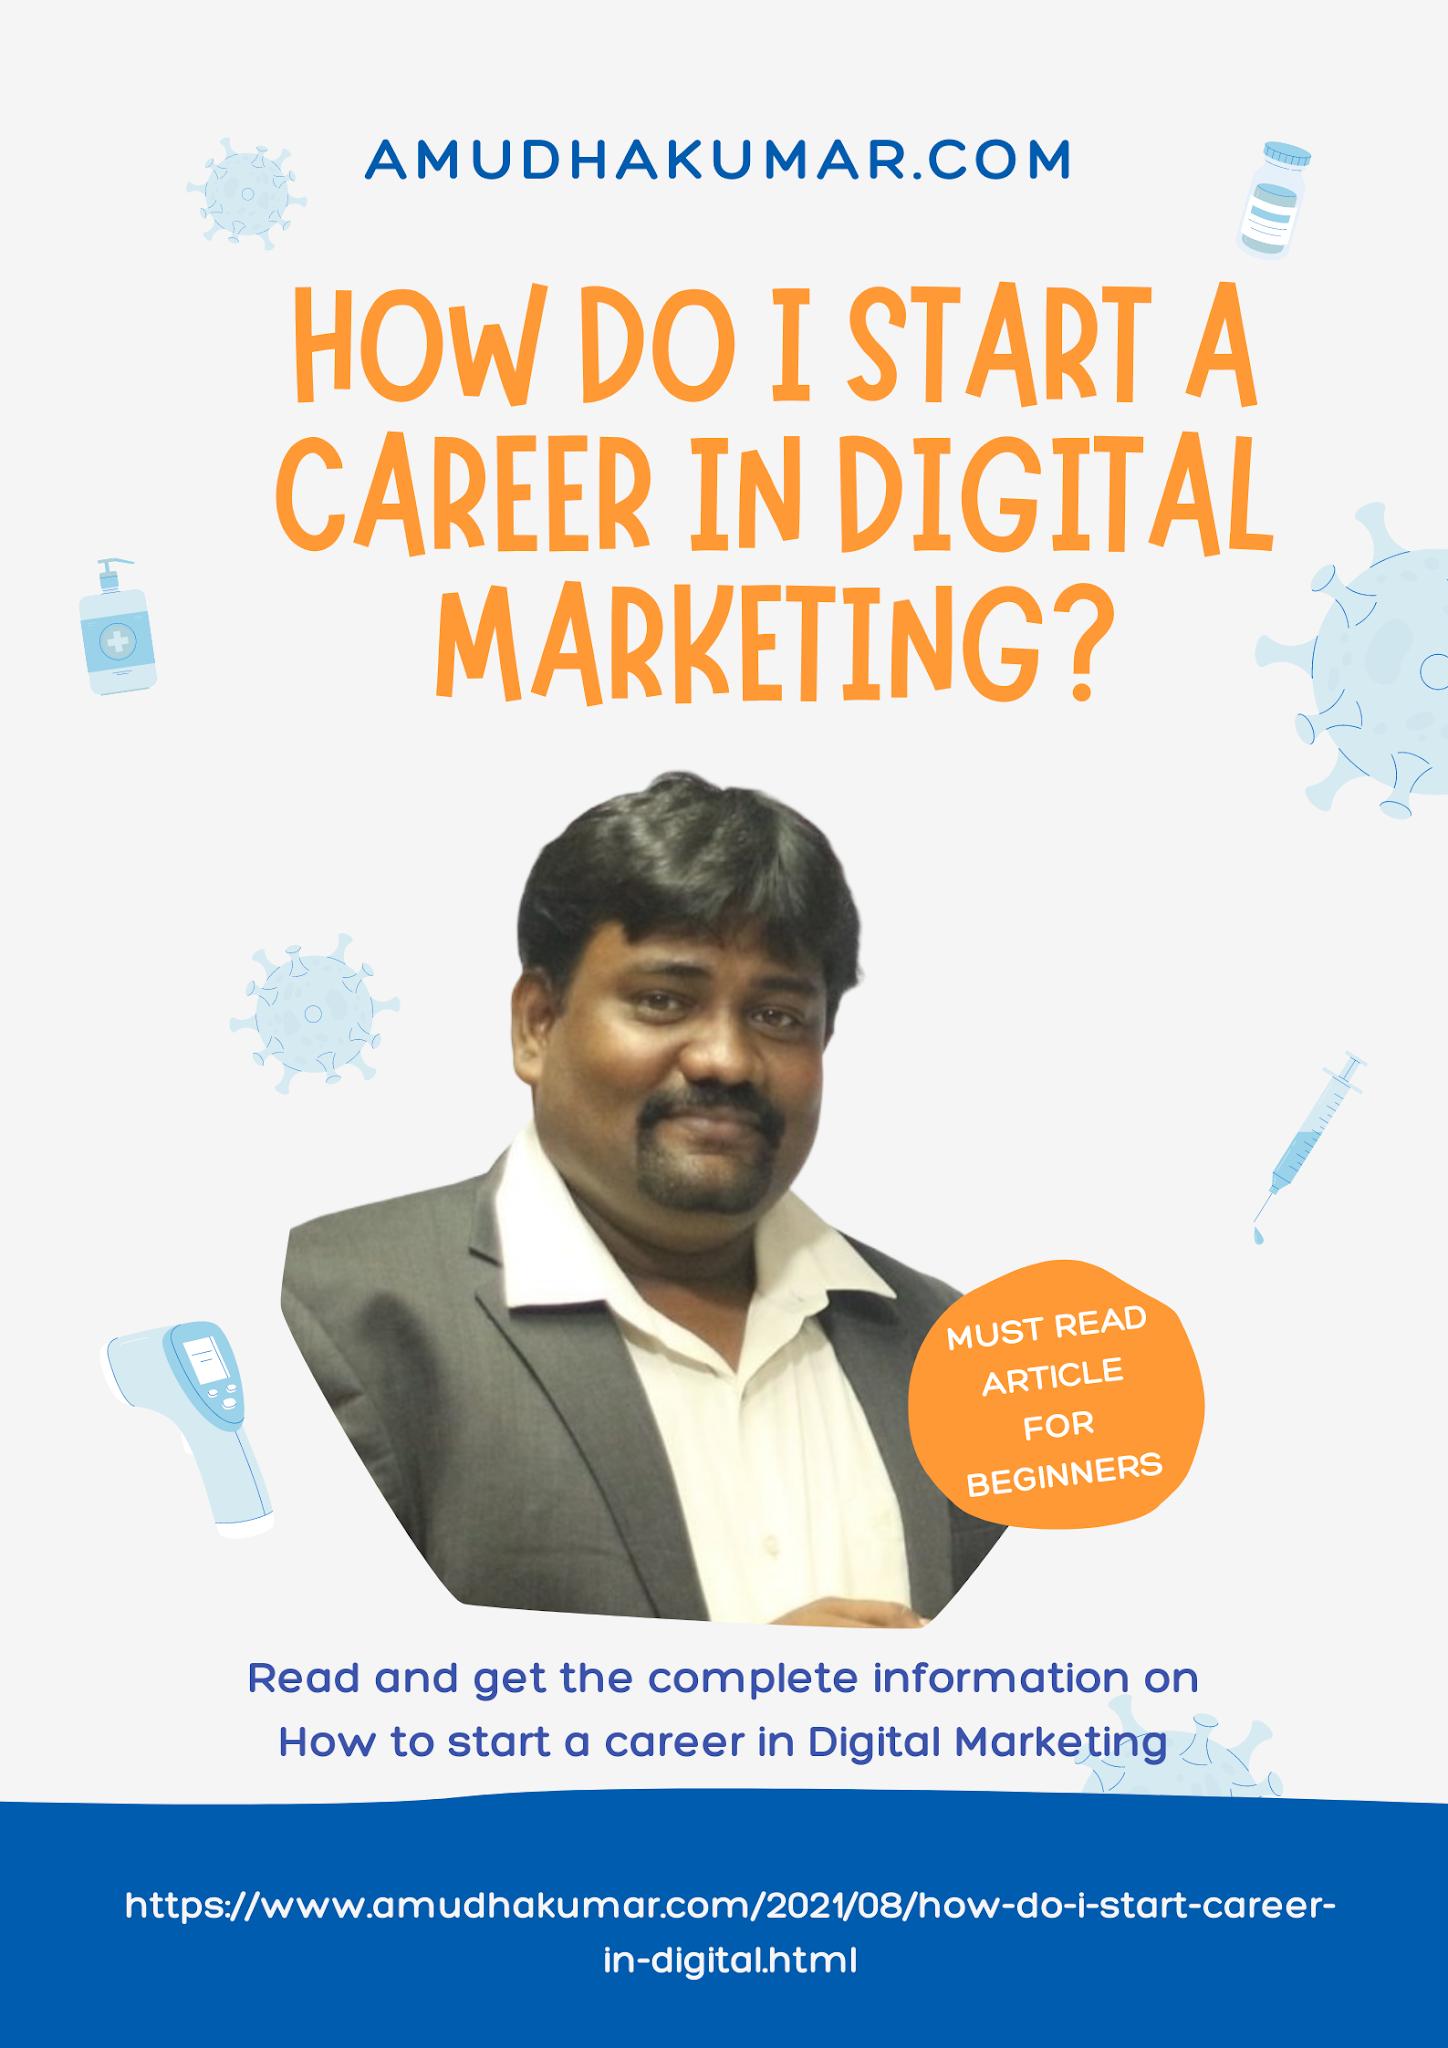 How Do I Start a Career in Digital Marketing?